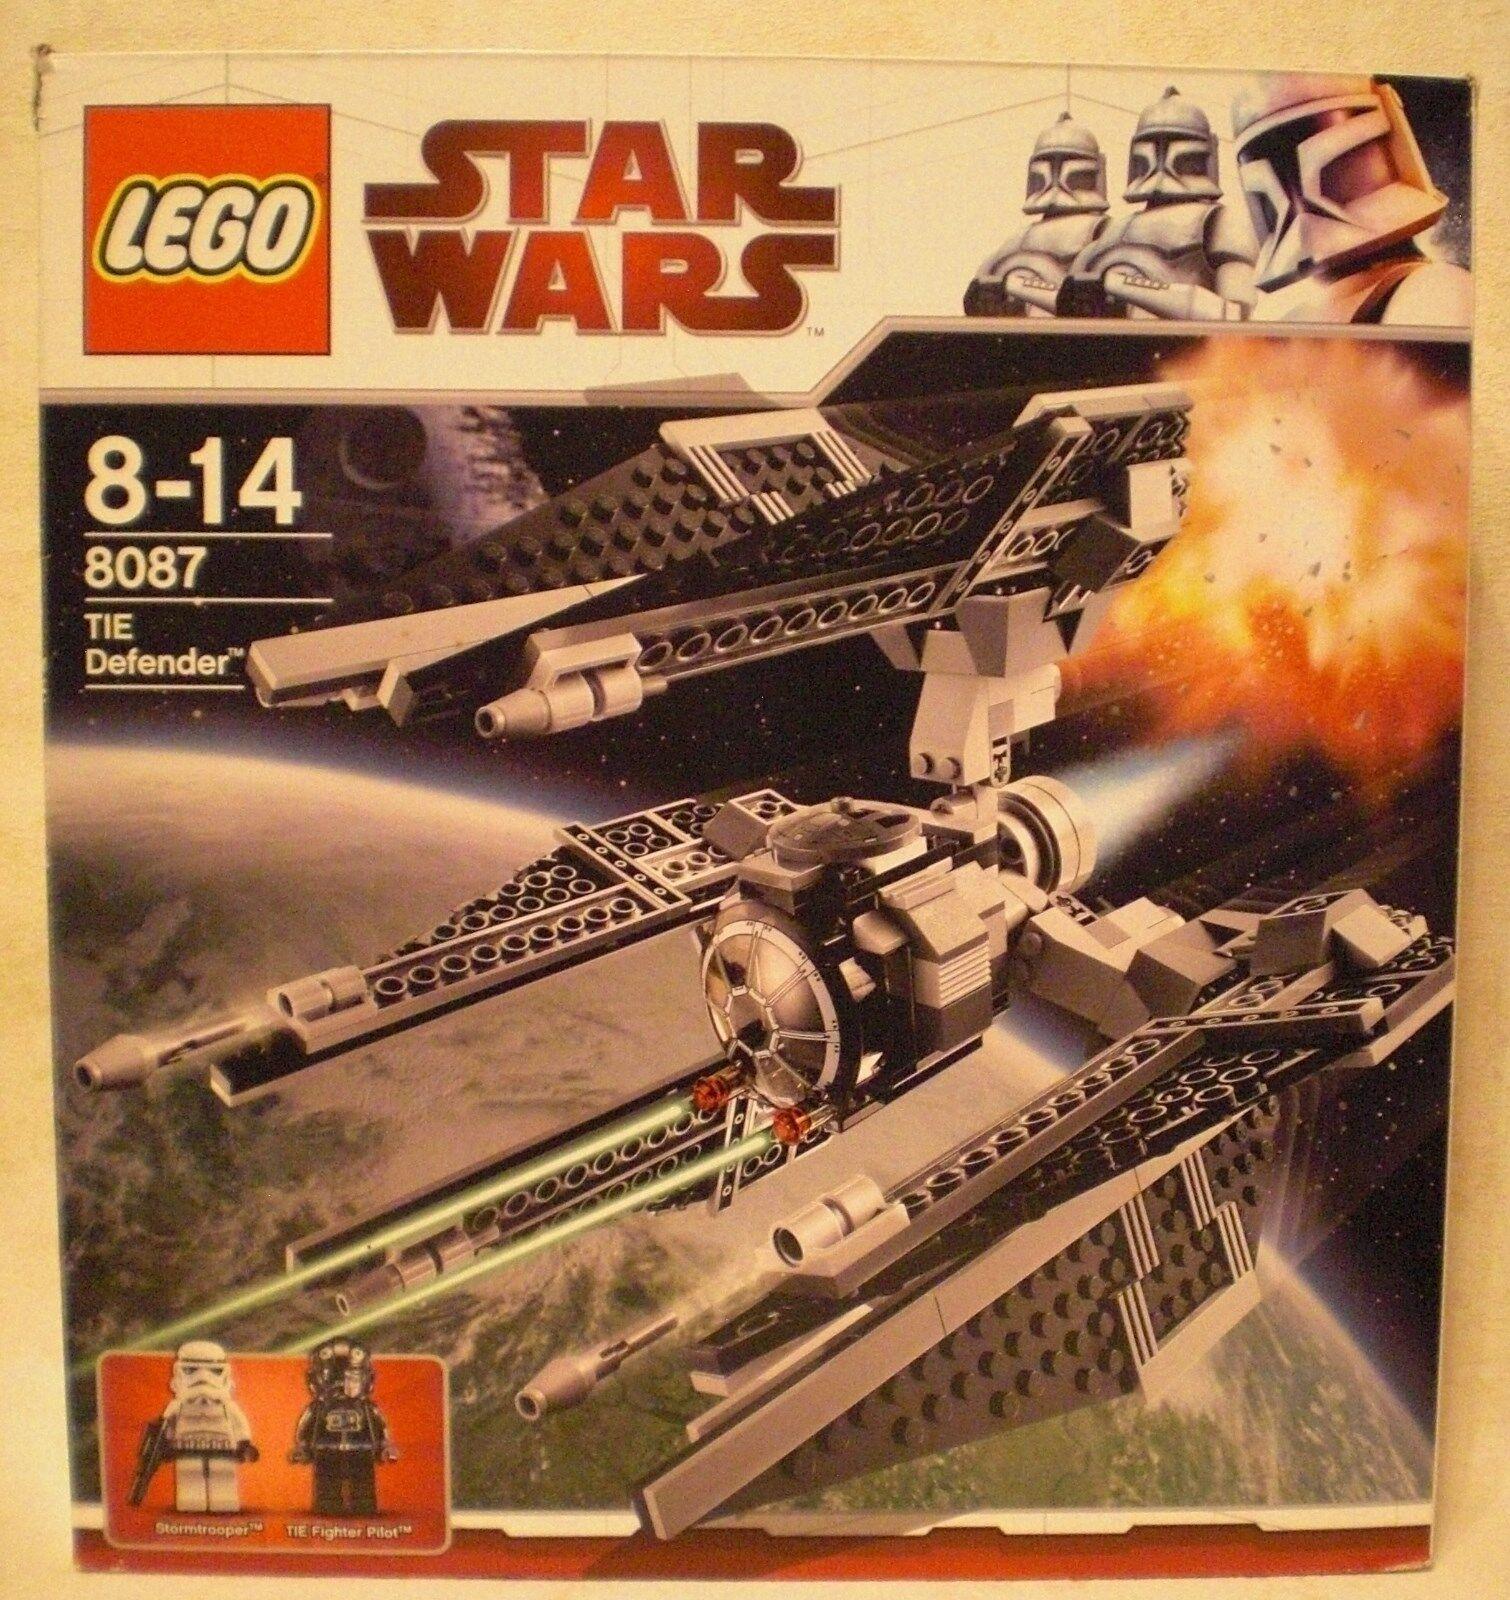 LEGO Star Wars 8087 - TIE Defender  Komplett mit Anleitung & OVP  TOP